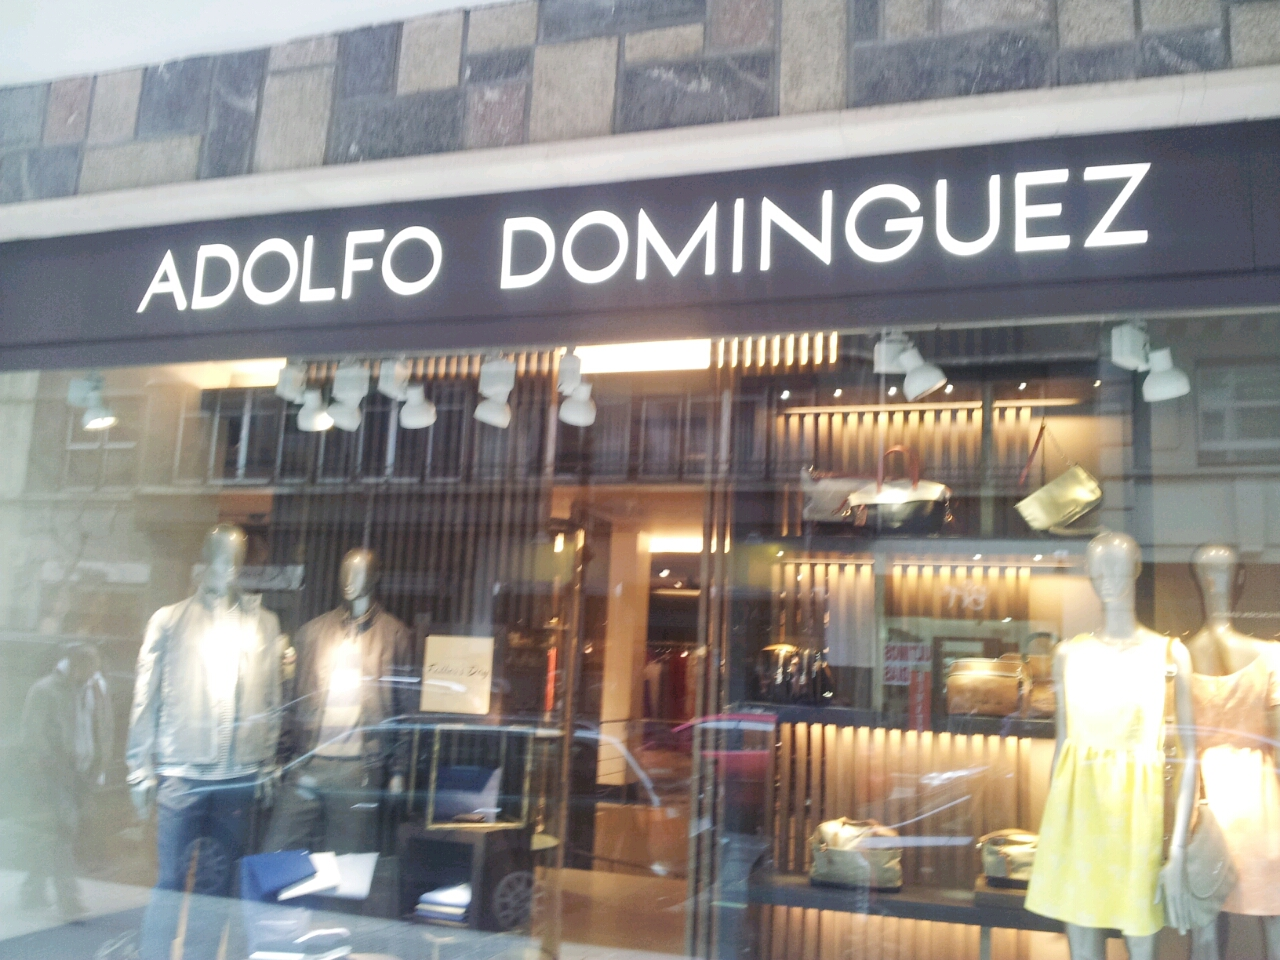 Look chic bilbao ruta de shopping for Adolfo dominguez plaza americas xalapa